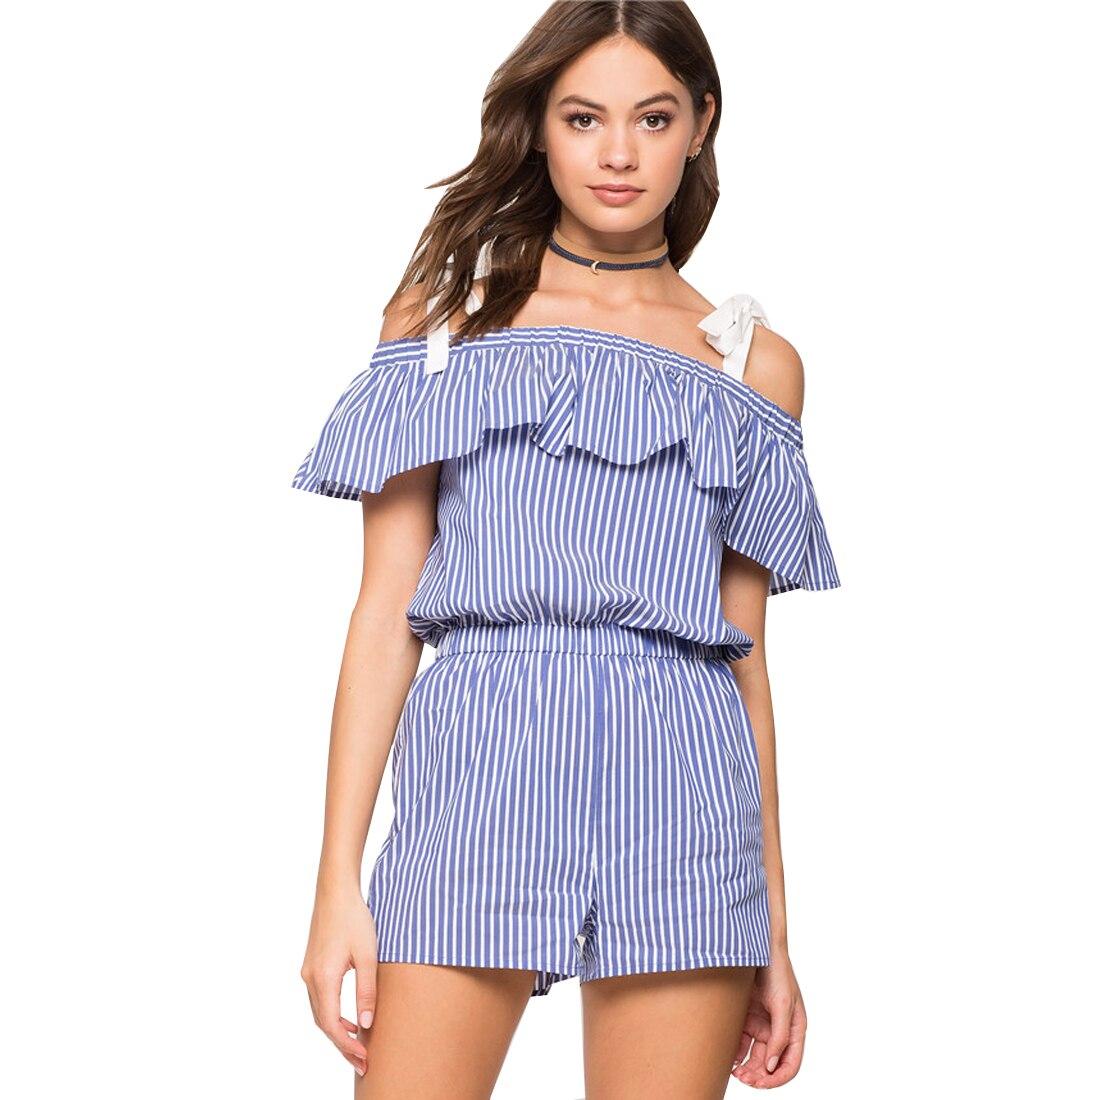 Slash Neck Blue Rompers Womens Jumpsuit Summer Sleeveless Strapless Bandage Playsuits 2017 Striped Sexy Bodysuits Ruffles Shorts